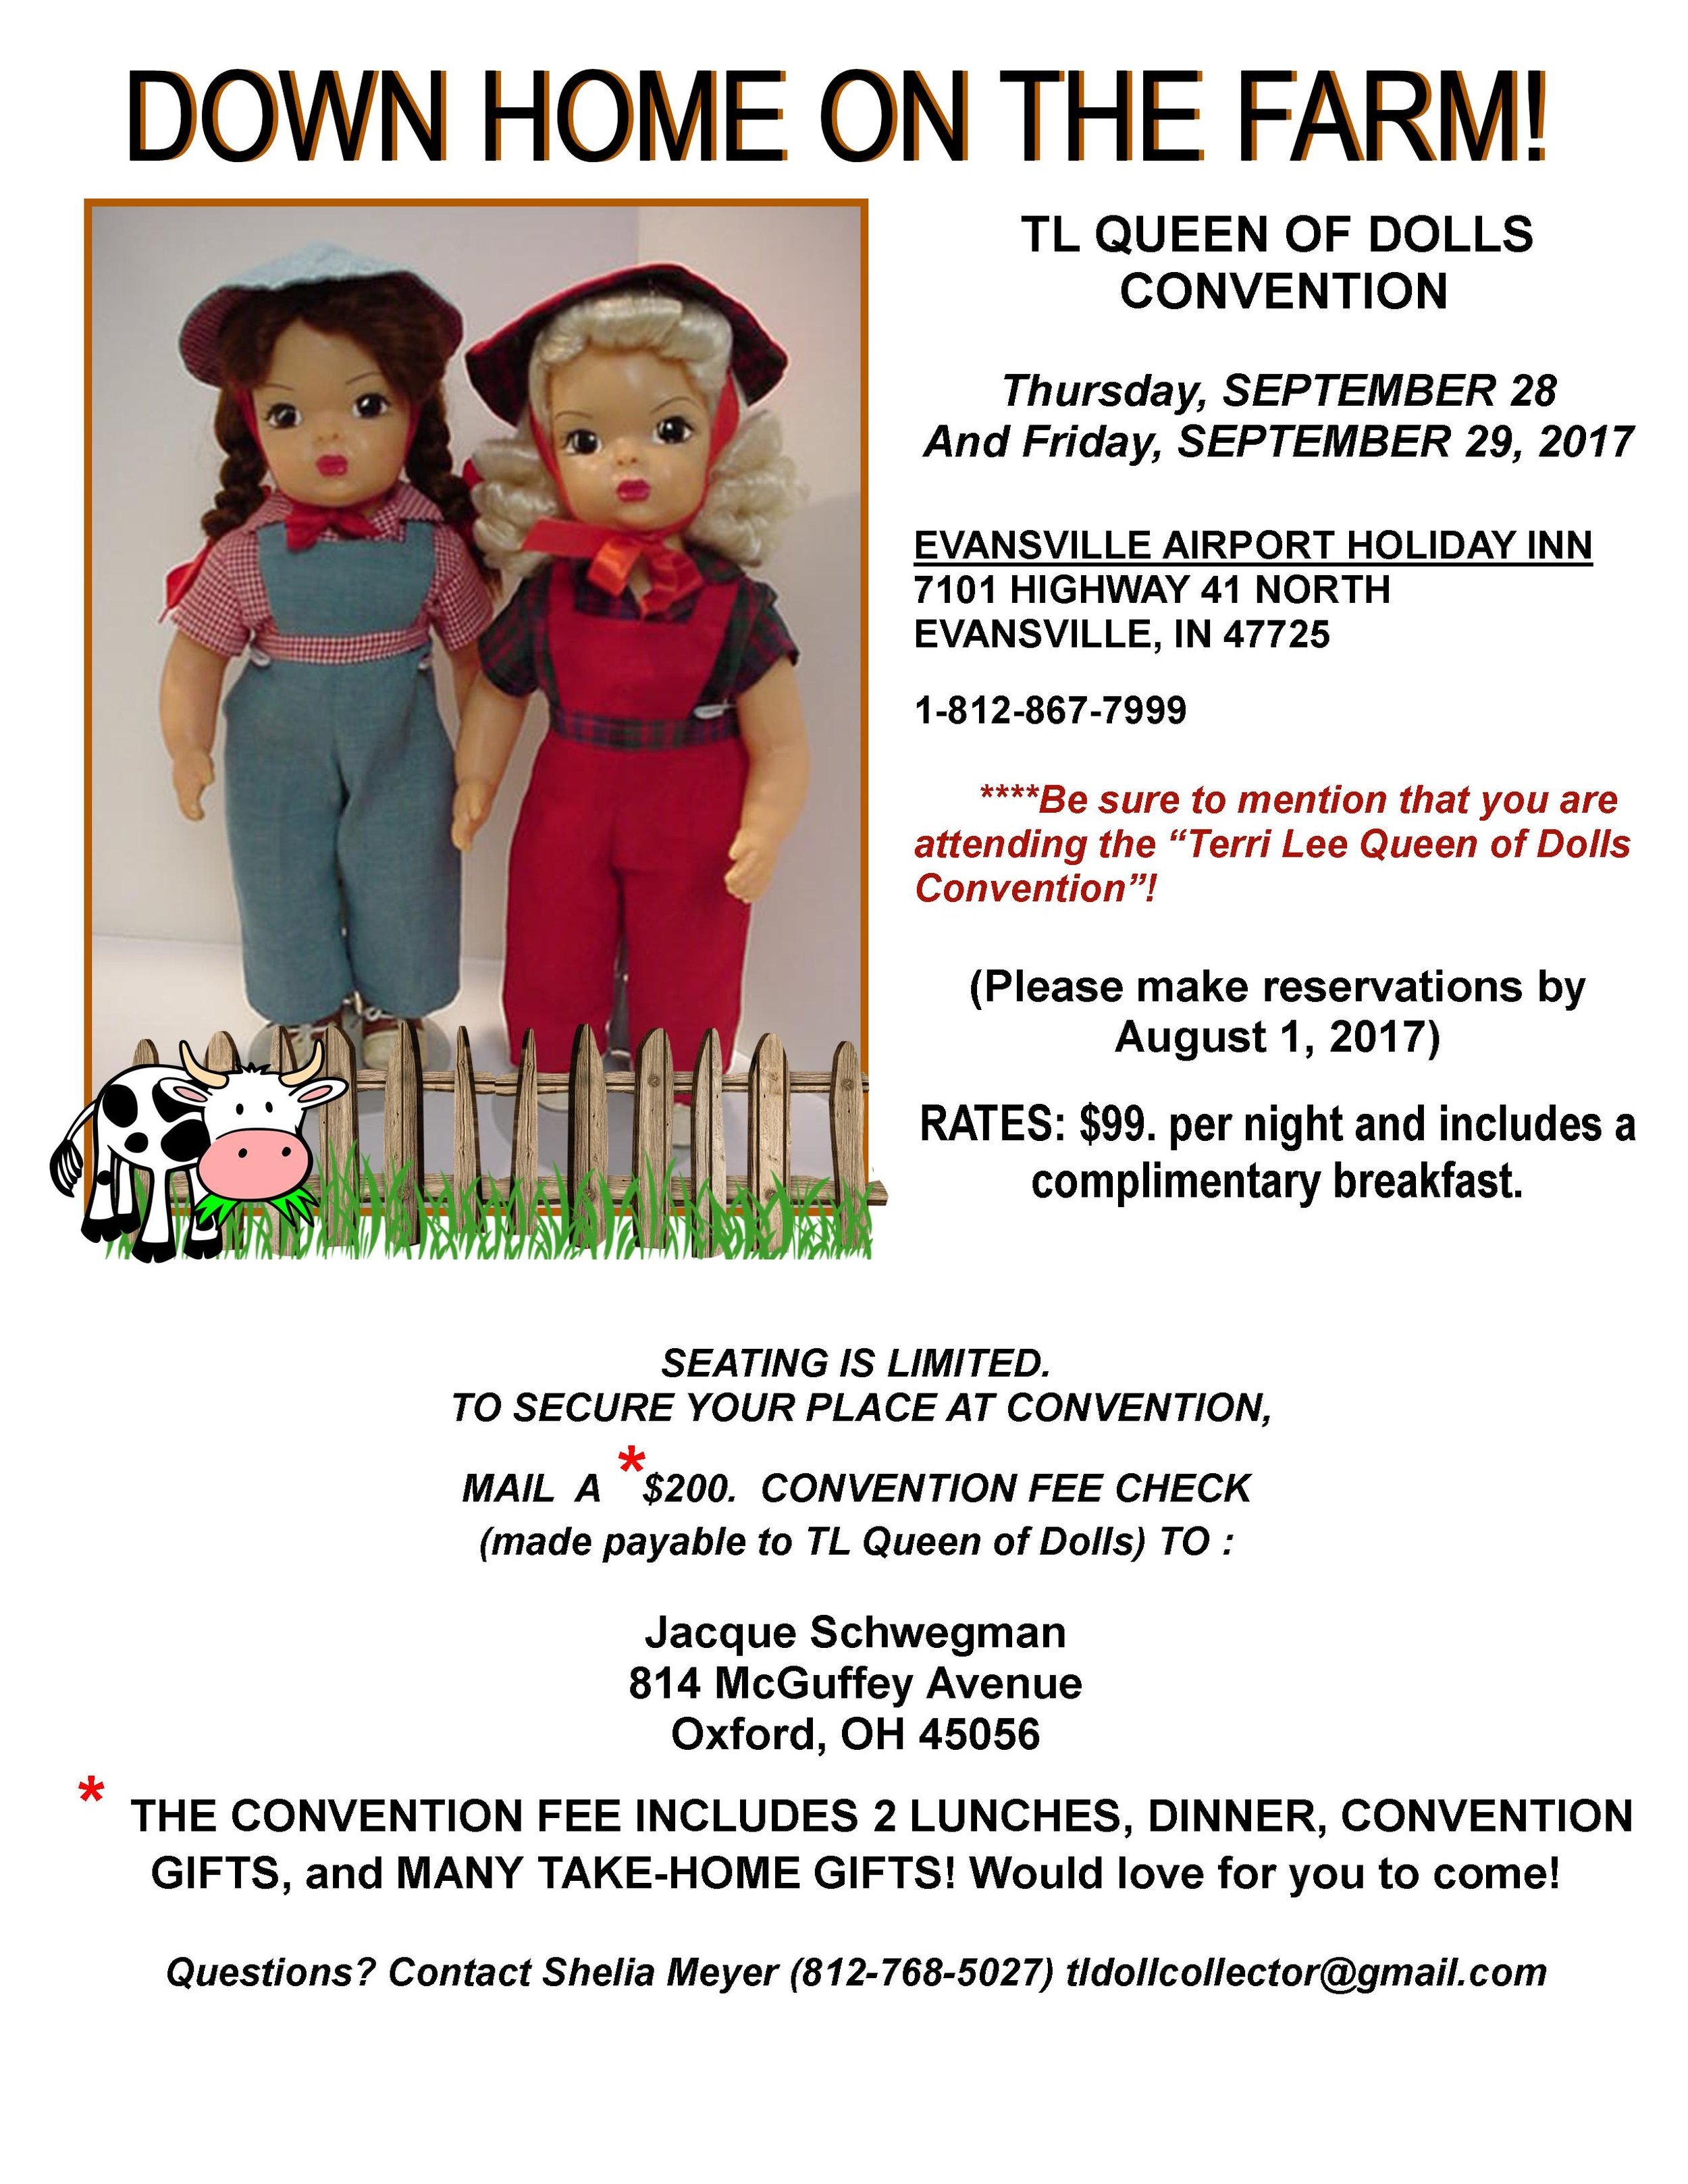 2017 convention flyer.JPG